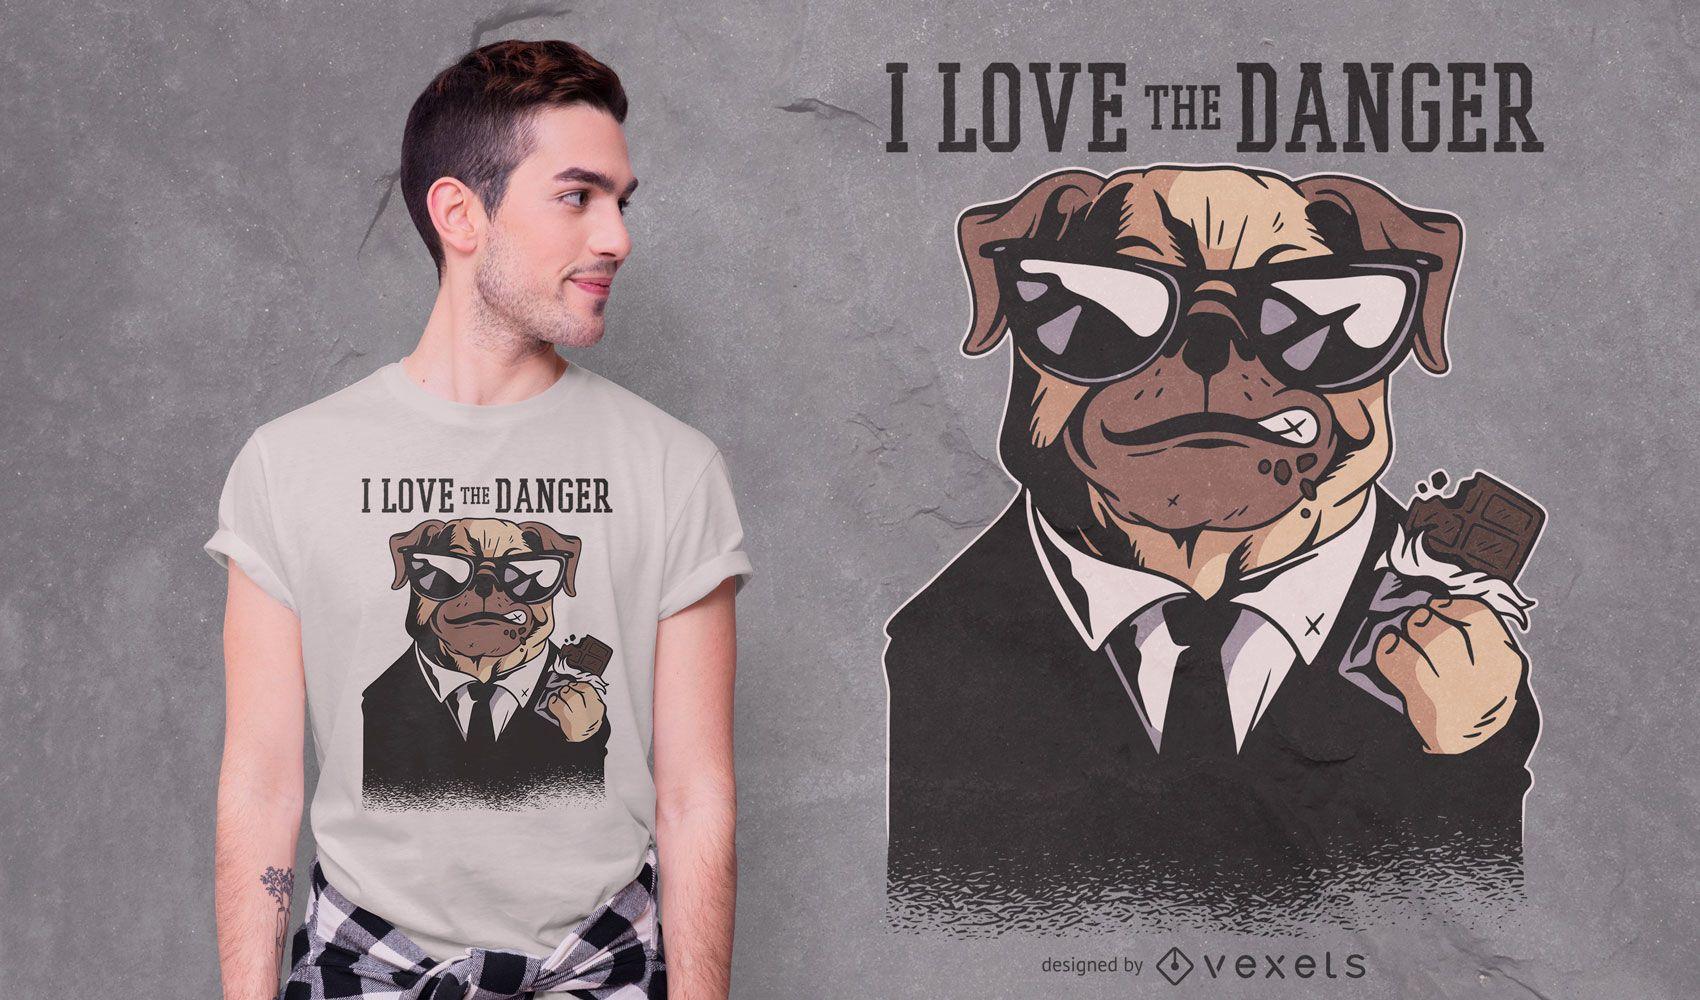 Dog danger quote t-shirt design